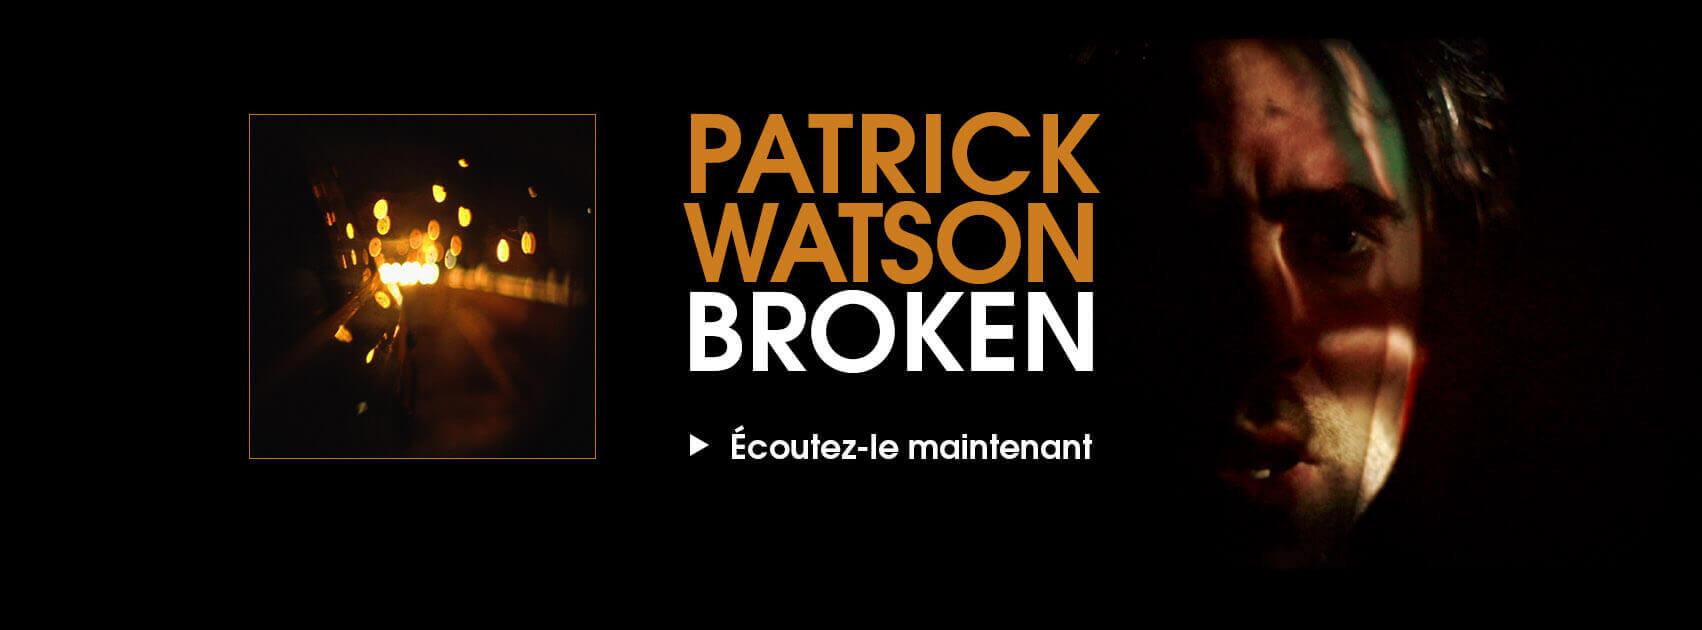 PatrickWatson-Broken-SCR-Fr